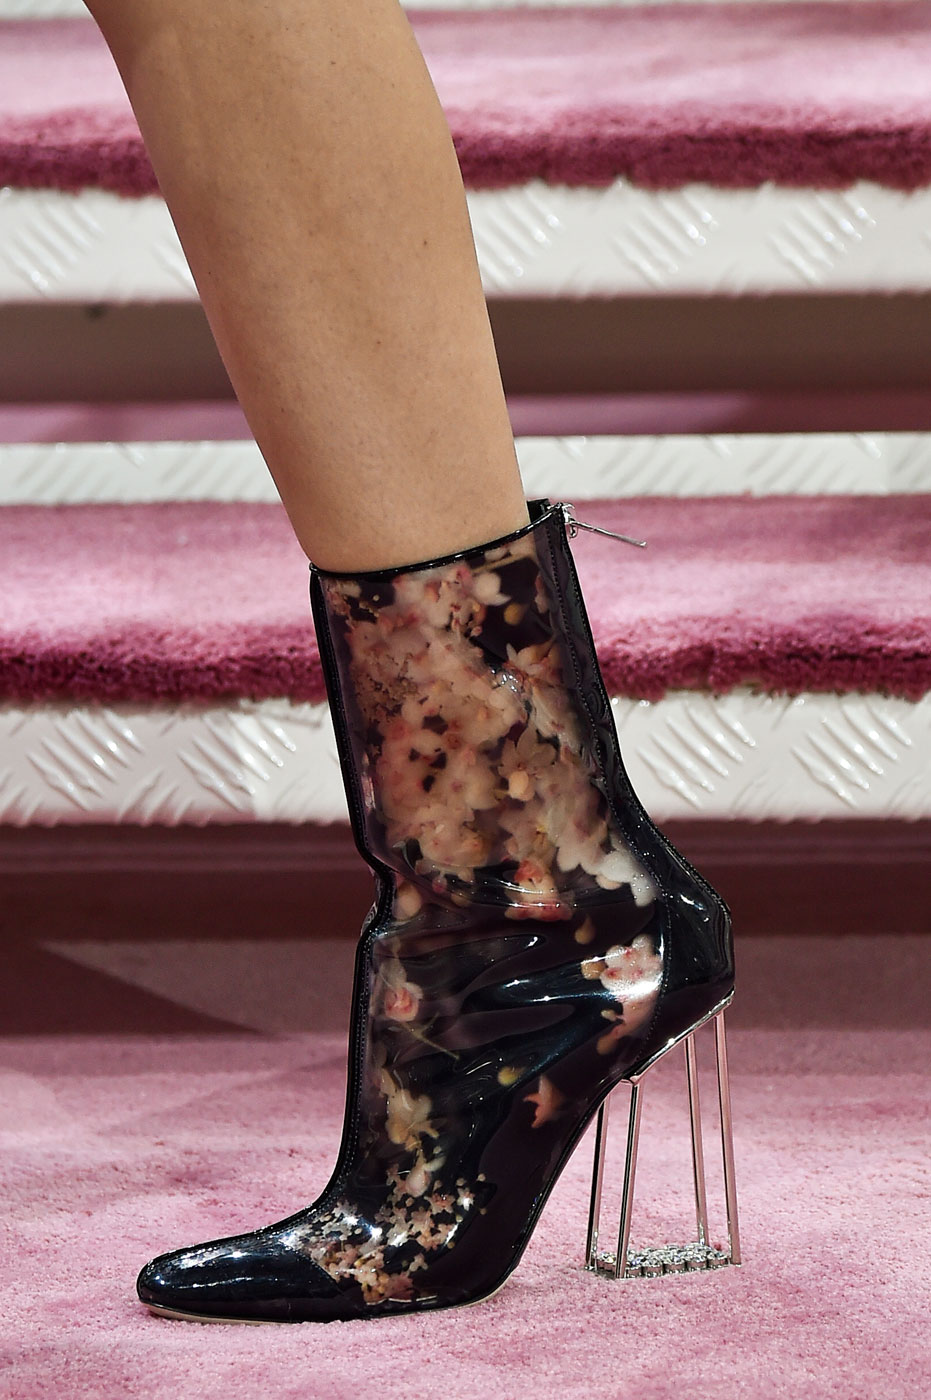 Christian-Dior-fashion-runway-show-close-ups-haute-couture-paris-spring-summer-2015-the-impression-129